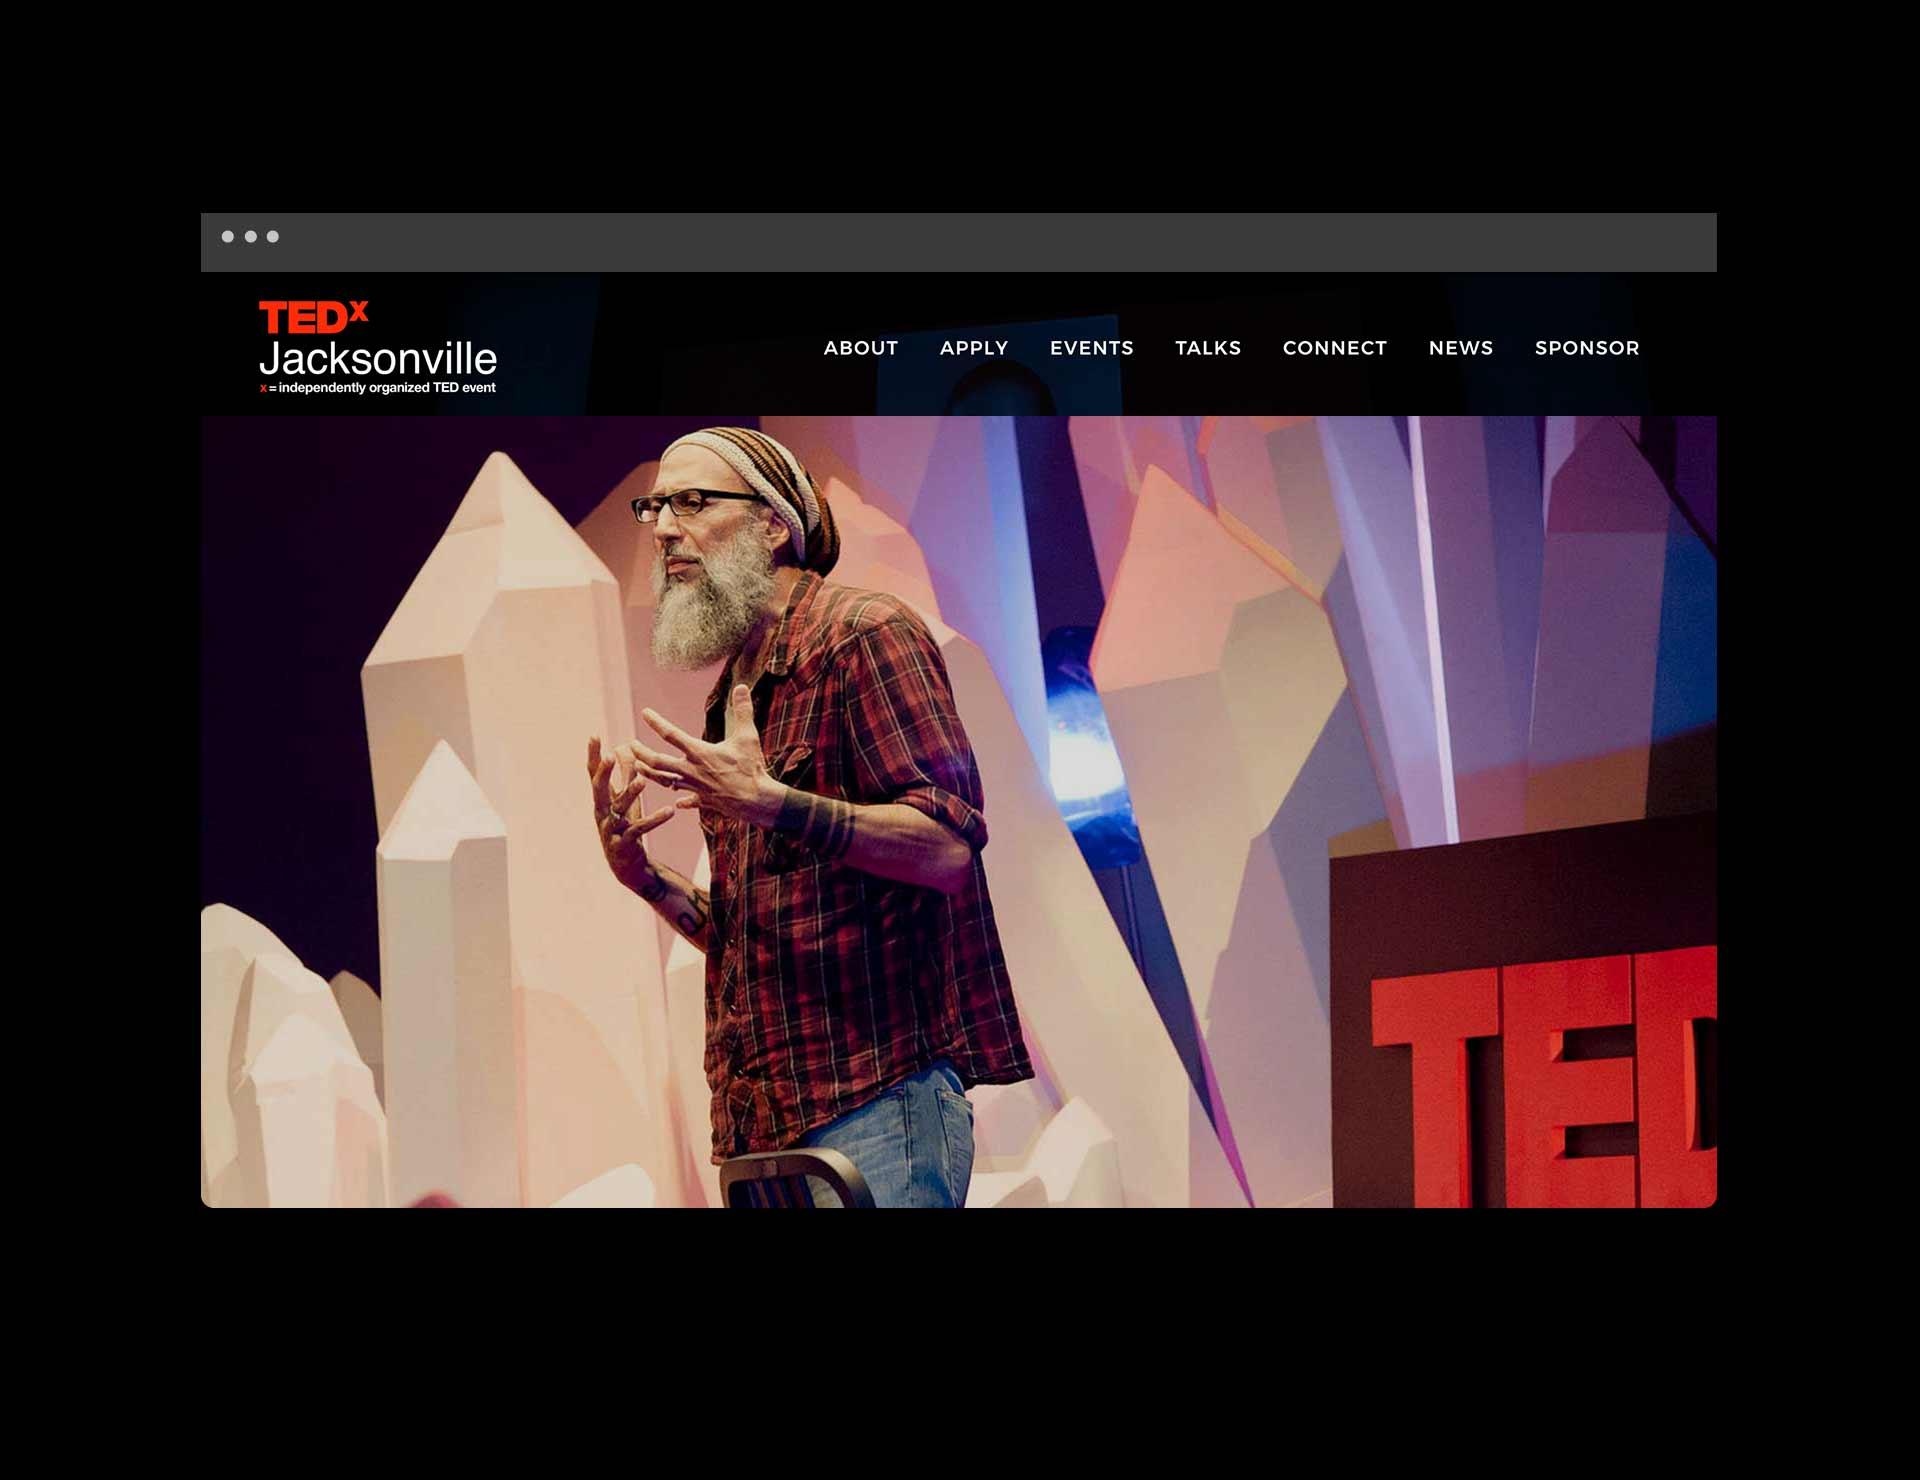 Tedx styleframe 1